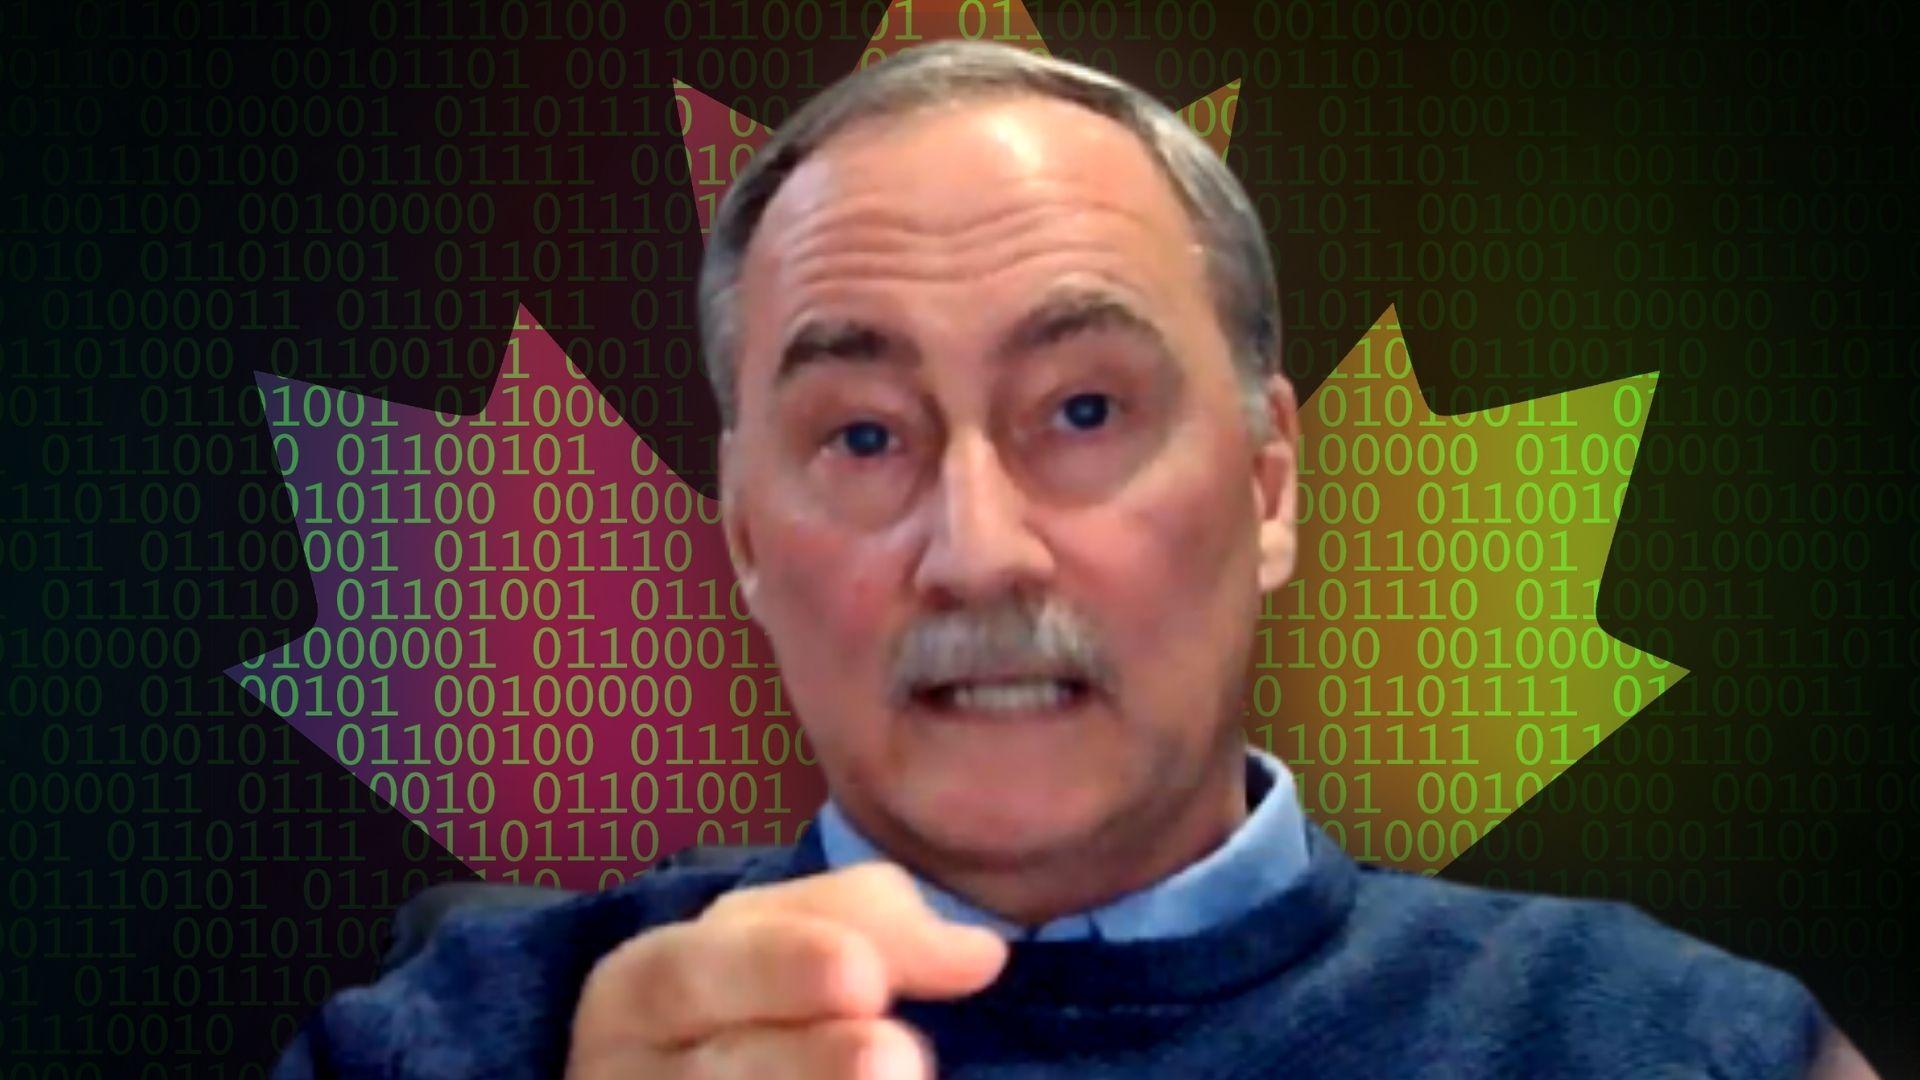 Al Treddenick – Is Saudi Arabia sending hit squads to Canada?